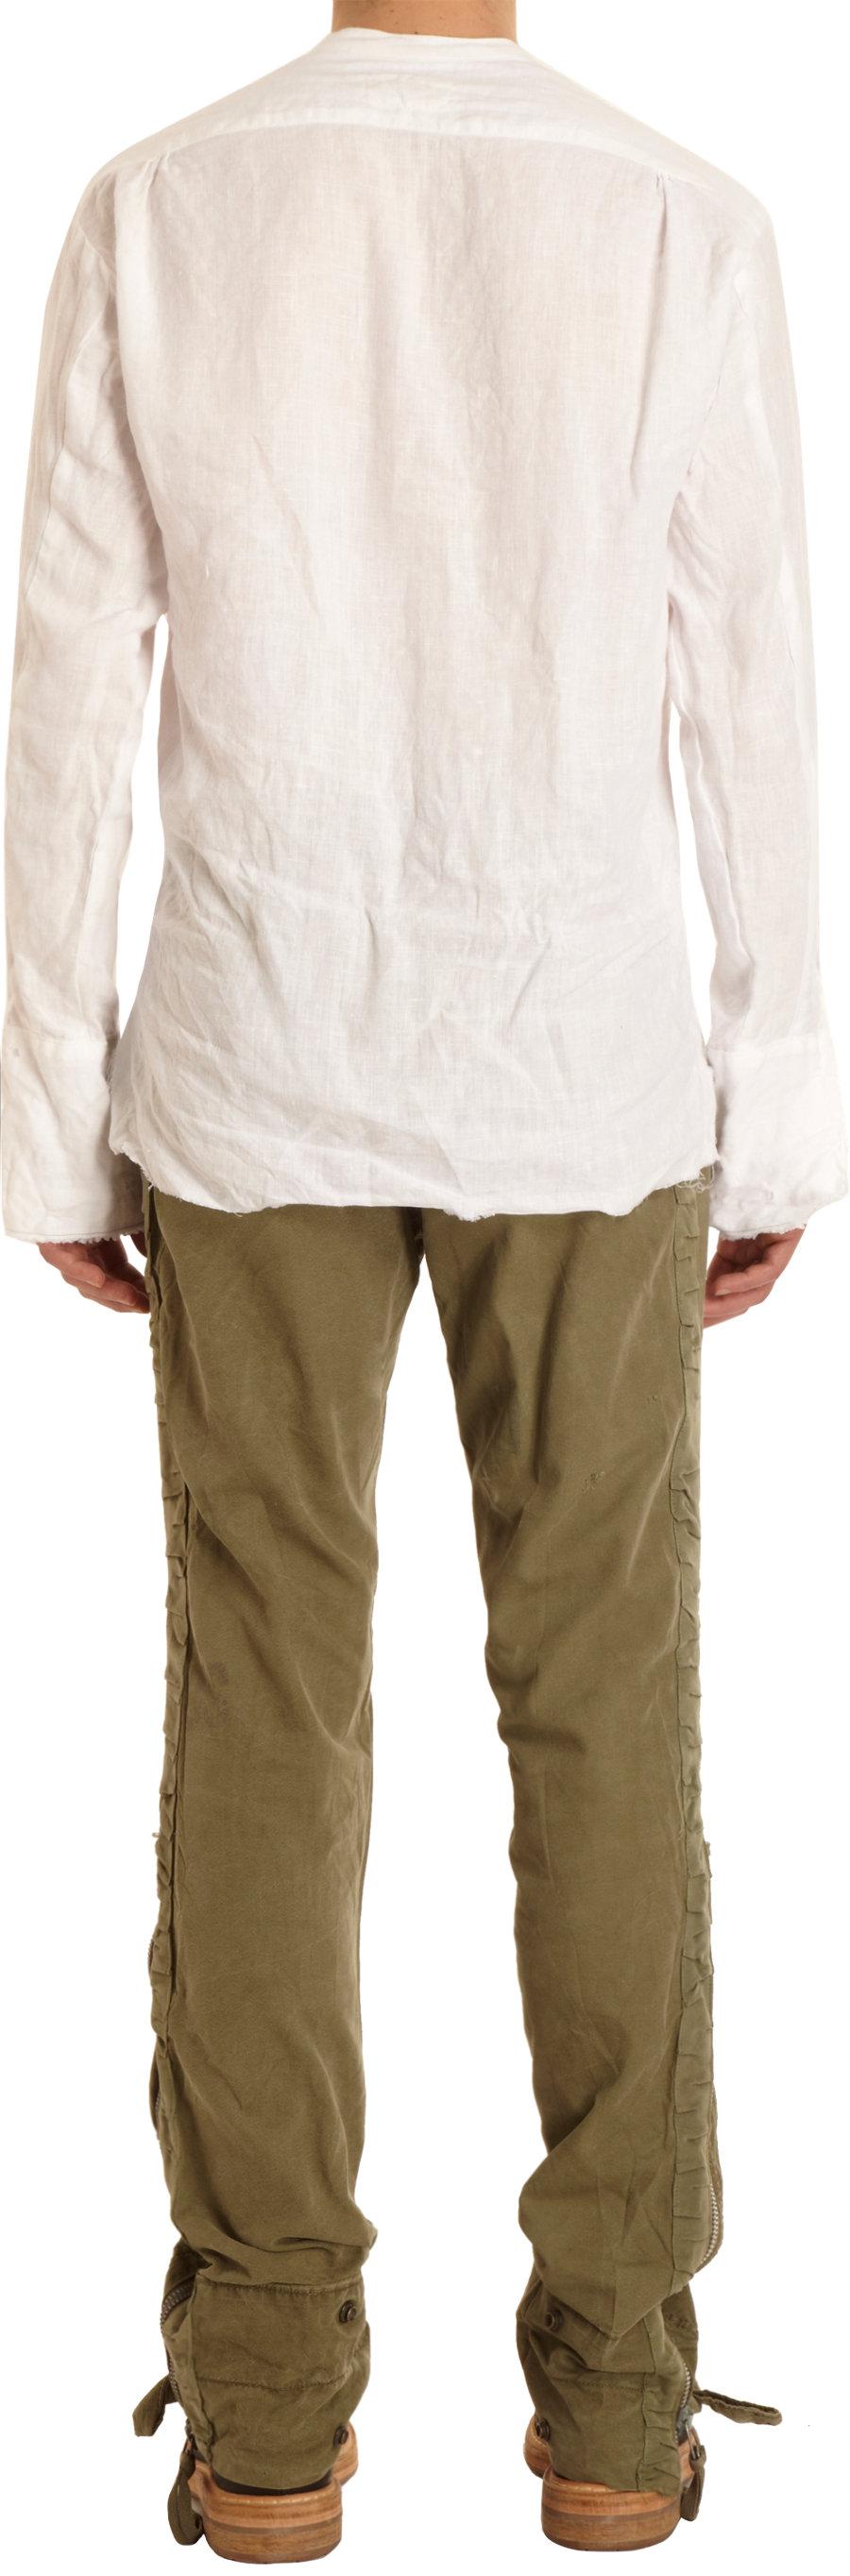 Gallery  sc 1 st  Lyst & Lyst - Greg lauren The Tent Tuxedo Pants in Green for Men